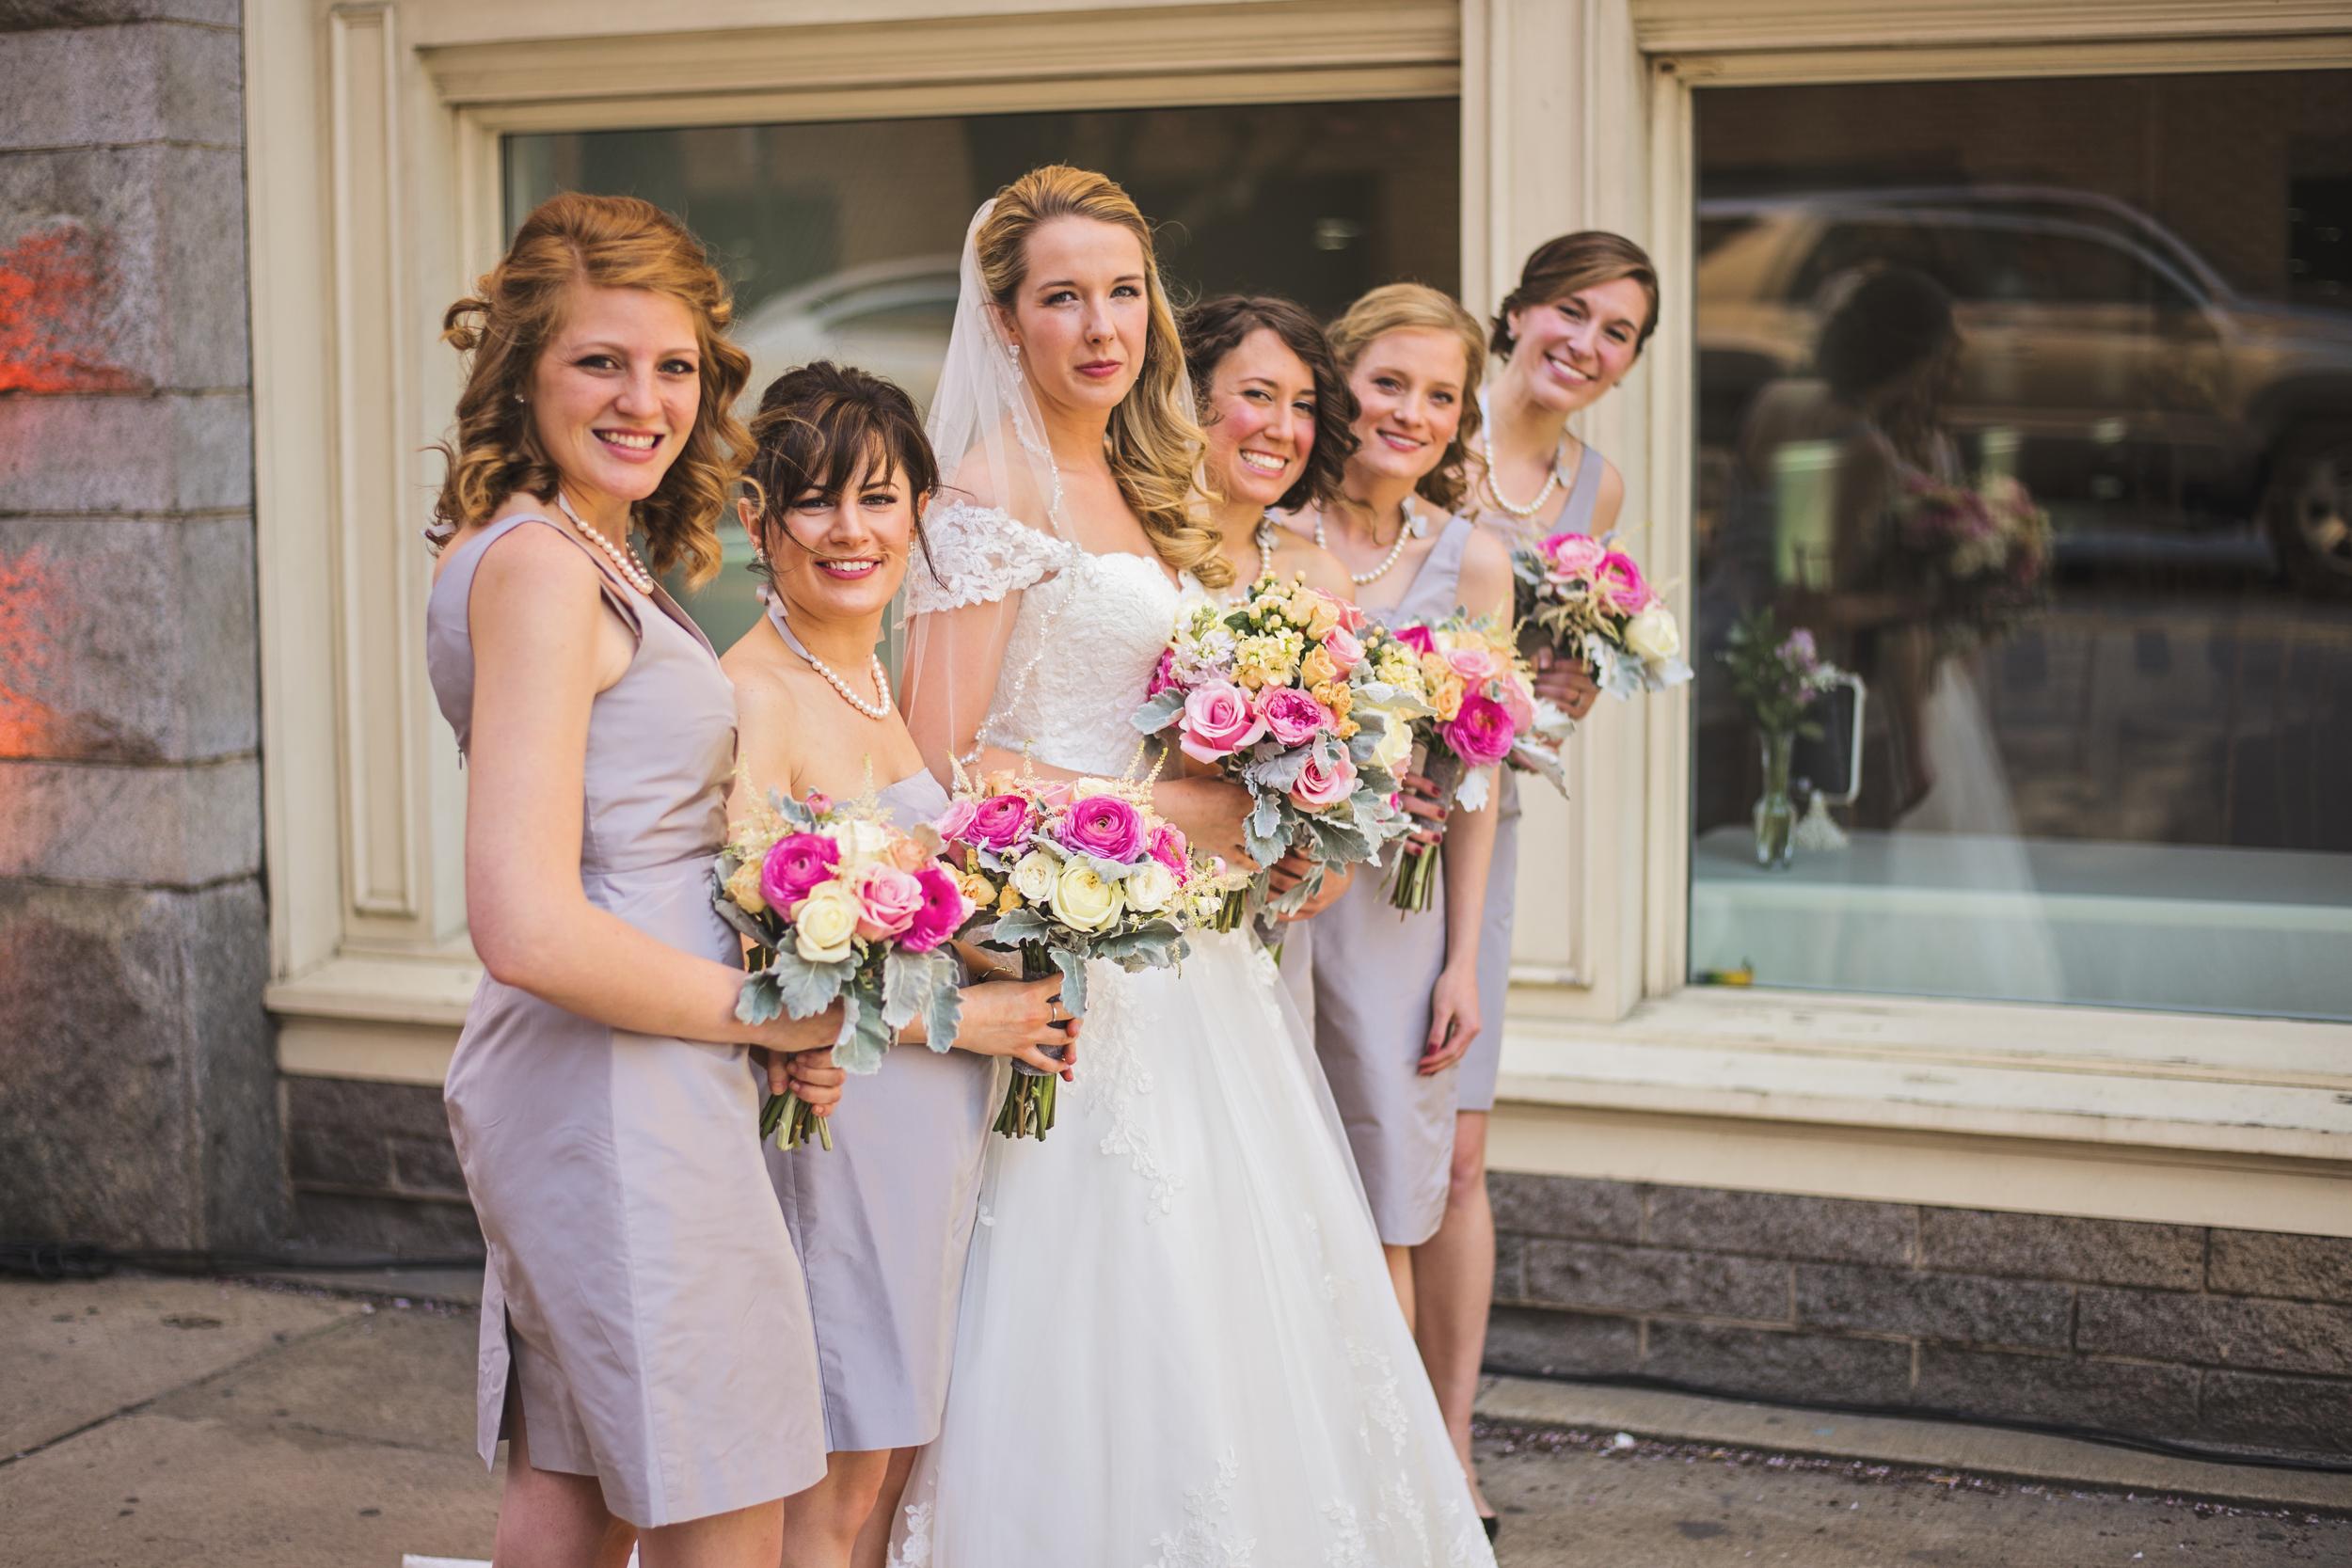 tresca_elegant_downtown_wedding_lynchburg_va015.jpg